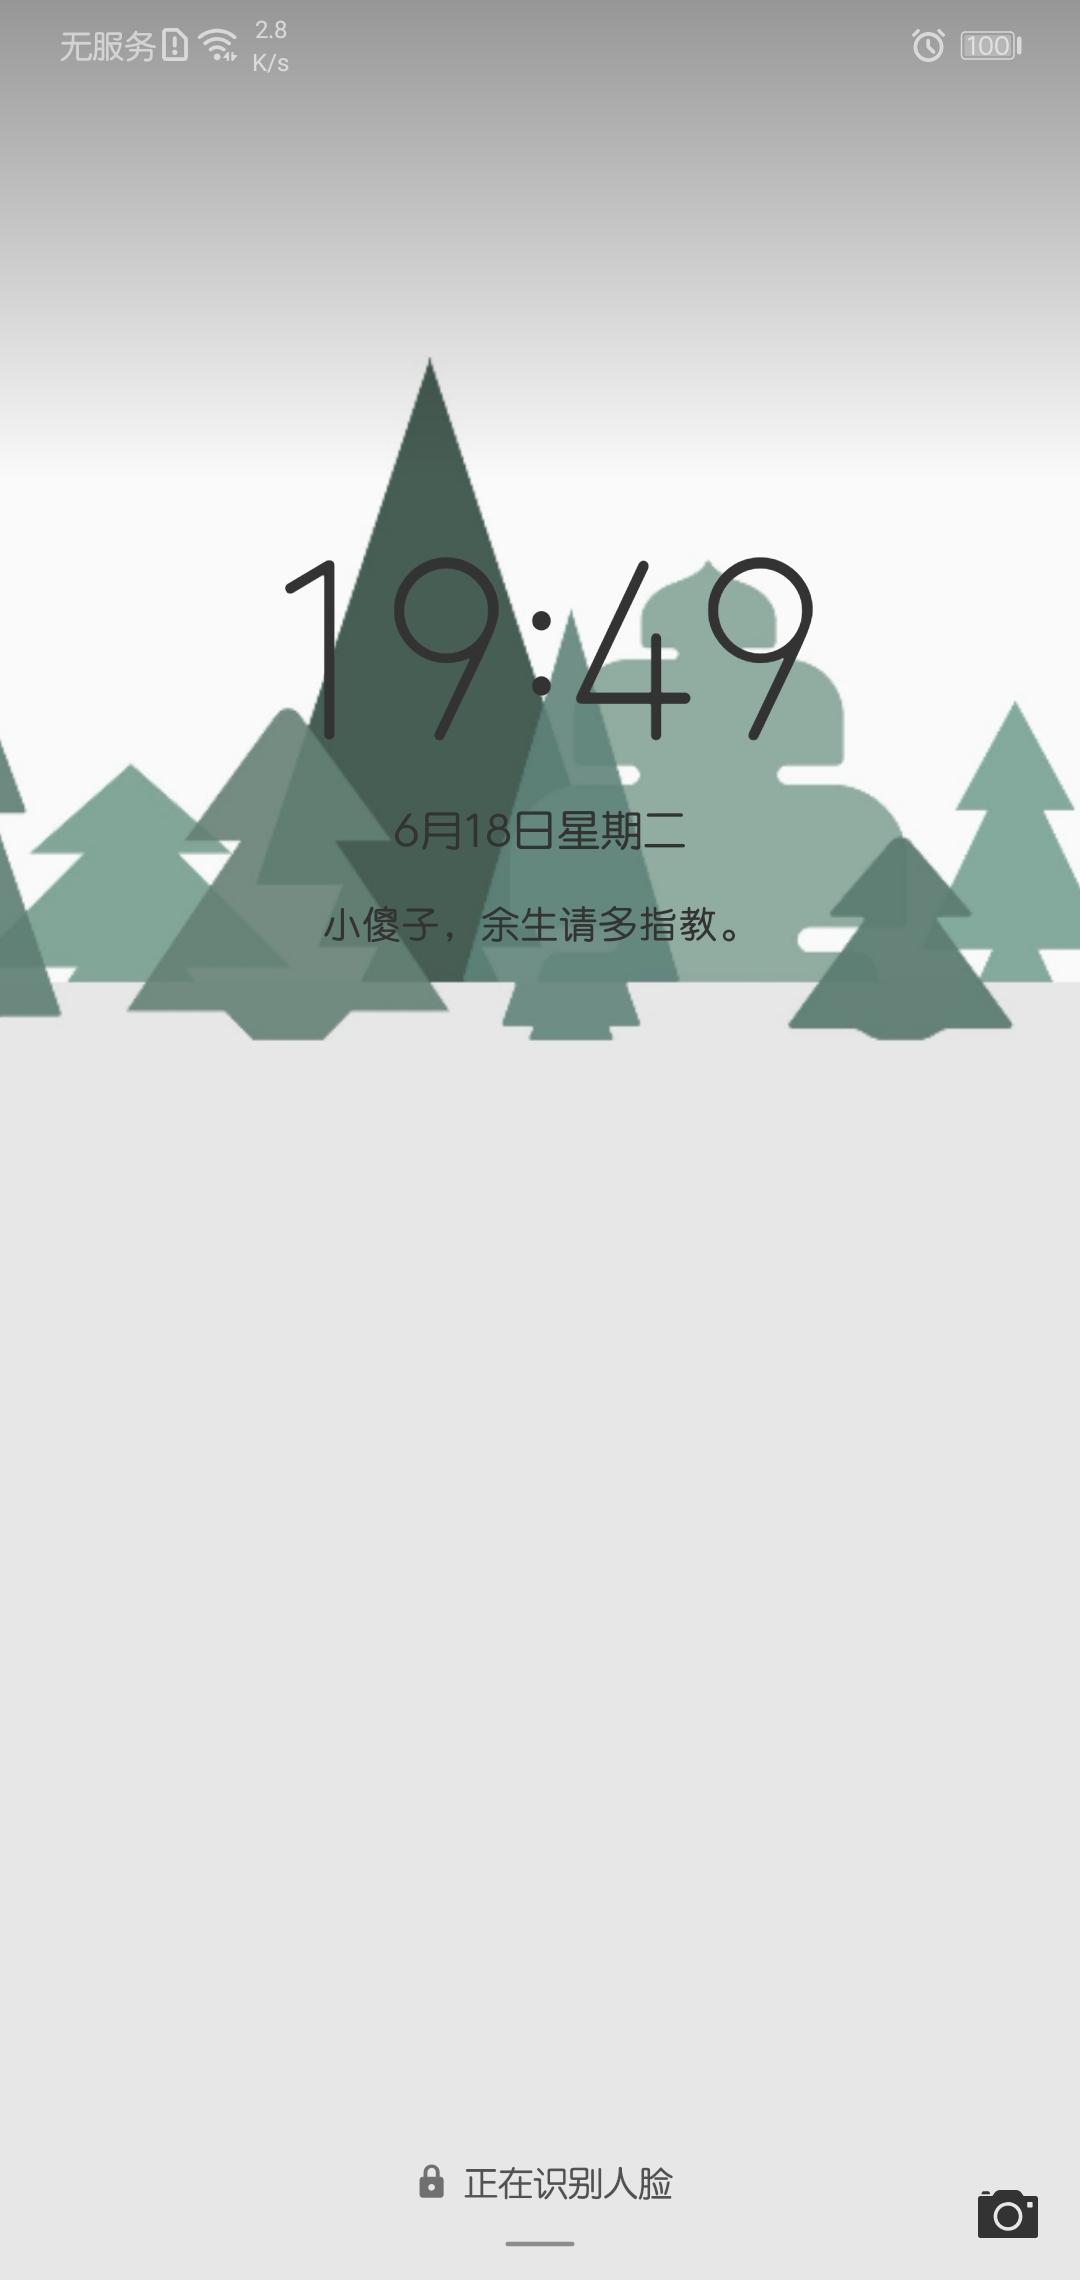 Screenshot_20190618_194903_com.android.keyguard.jpg